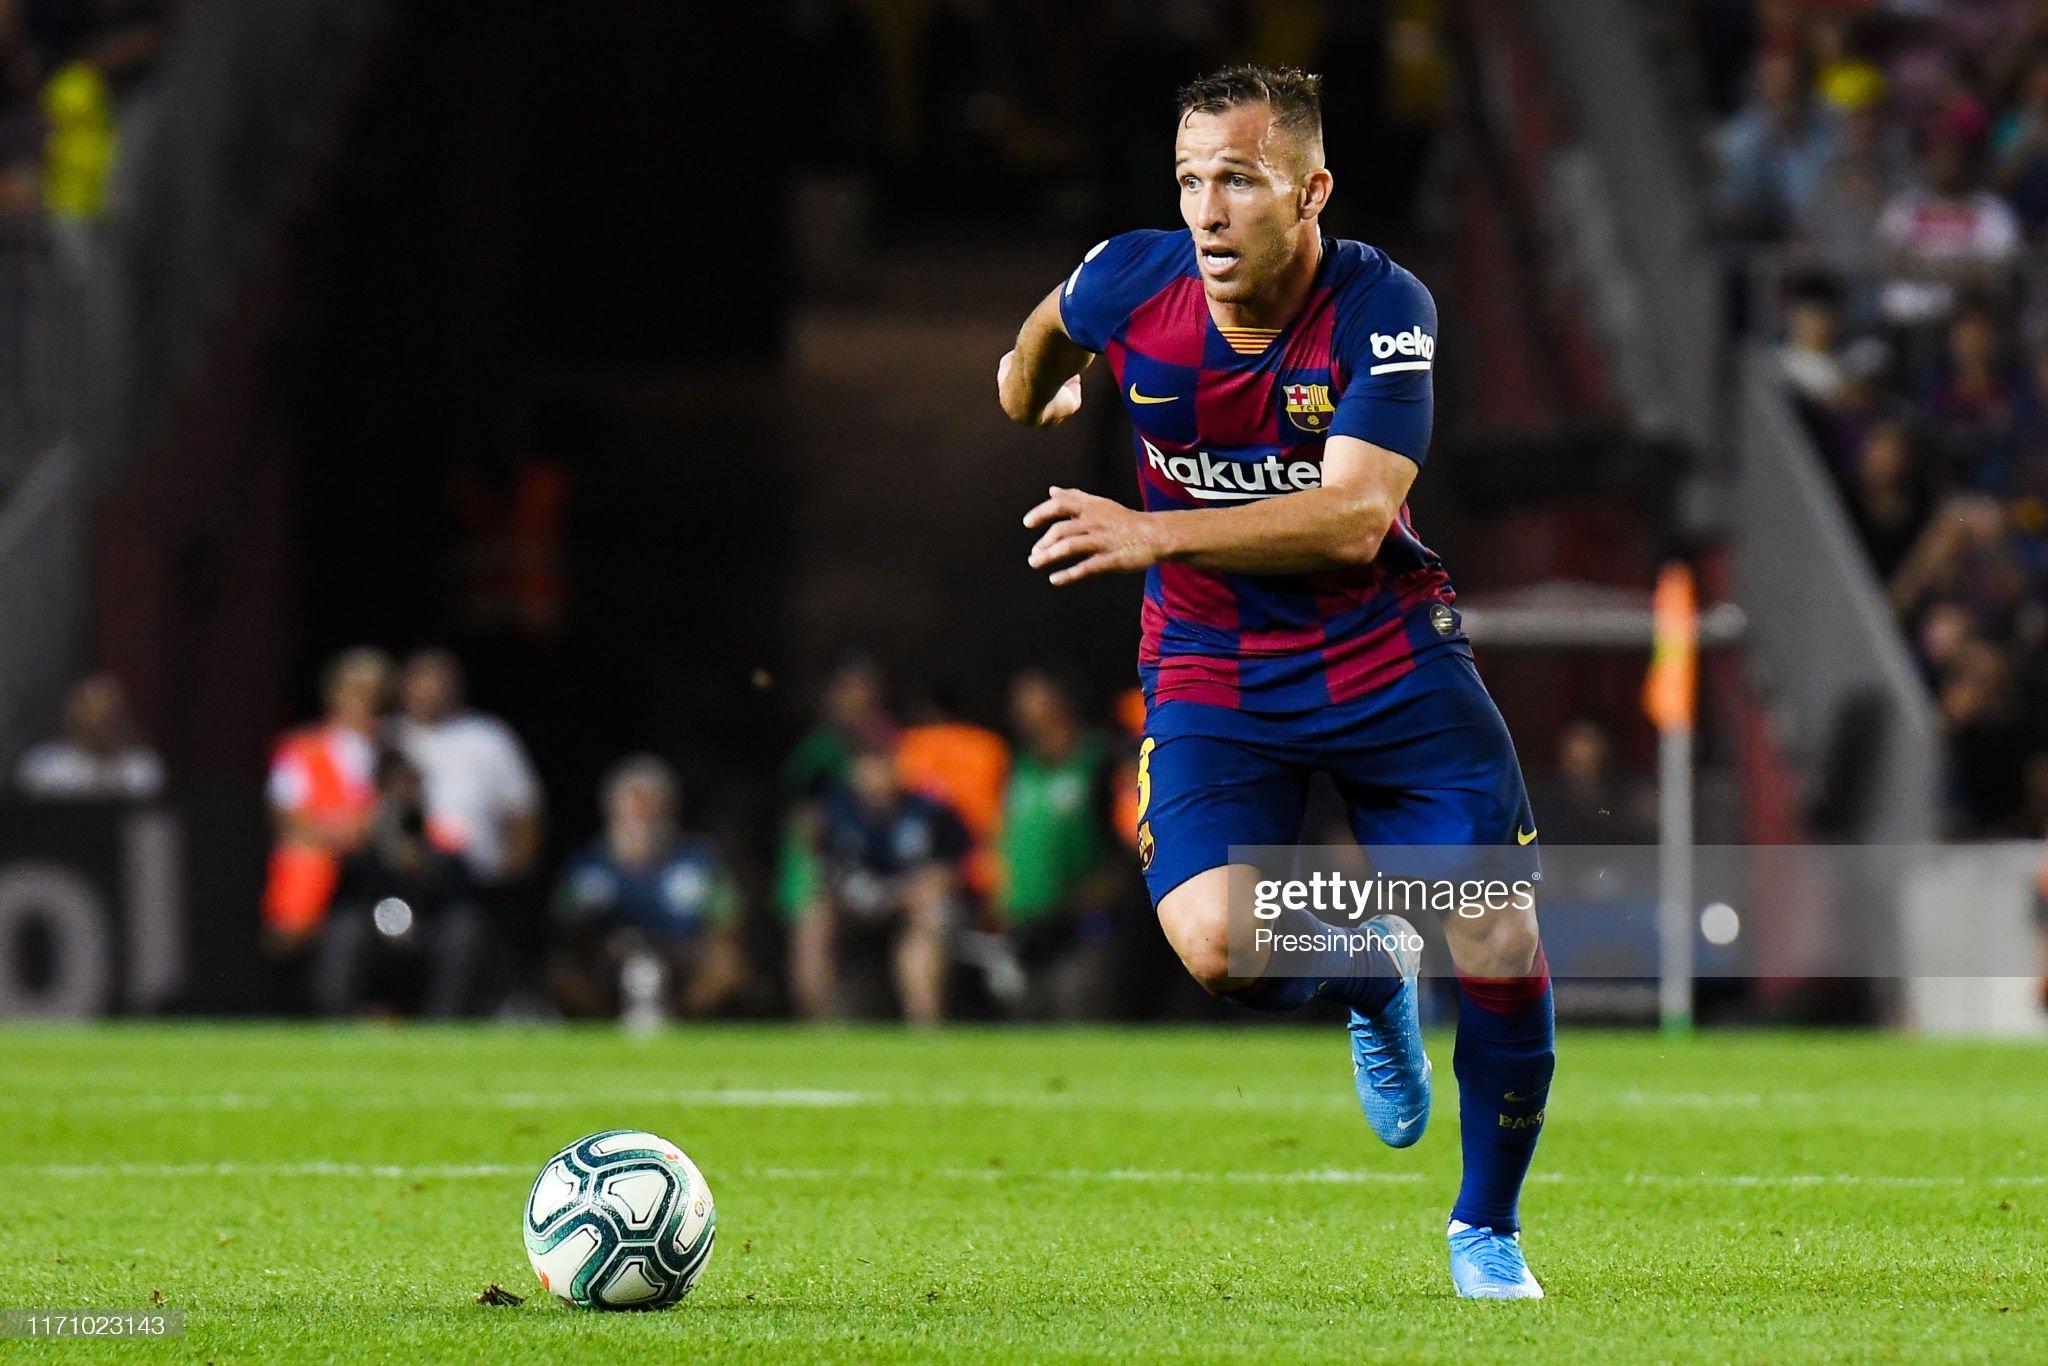 صور مباراة : برشلونة - فياريال 2-1 ( 24-09-2019 )  Arthur-melo-of-fc-barcelona-during-the-liga-match-between-barcelona-picture-id1171023143?s=2048x2048